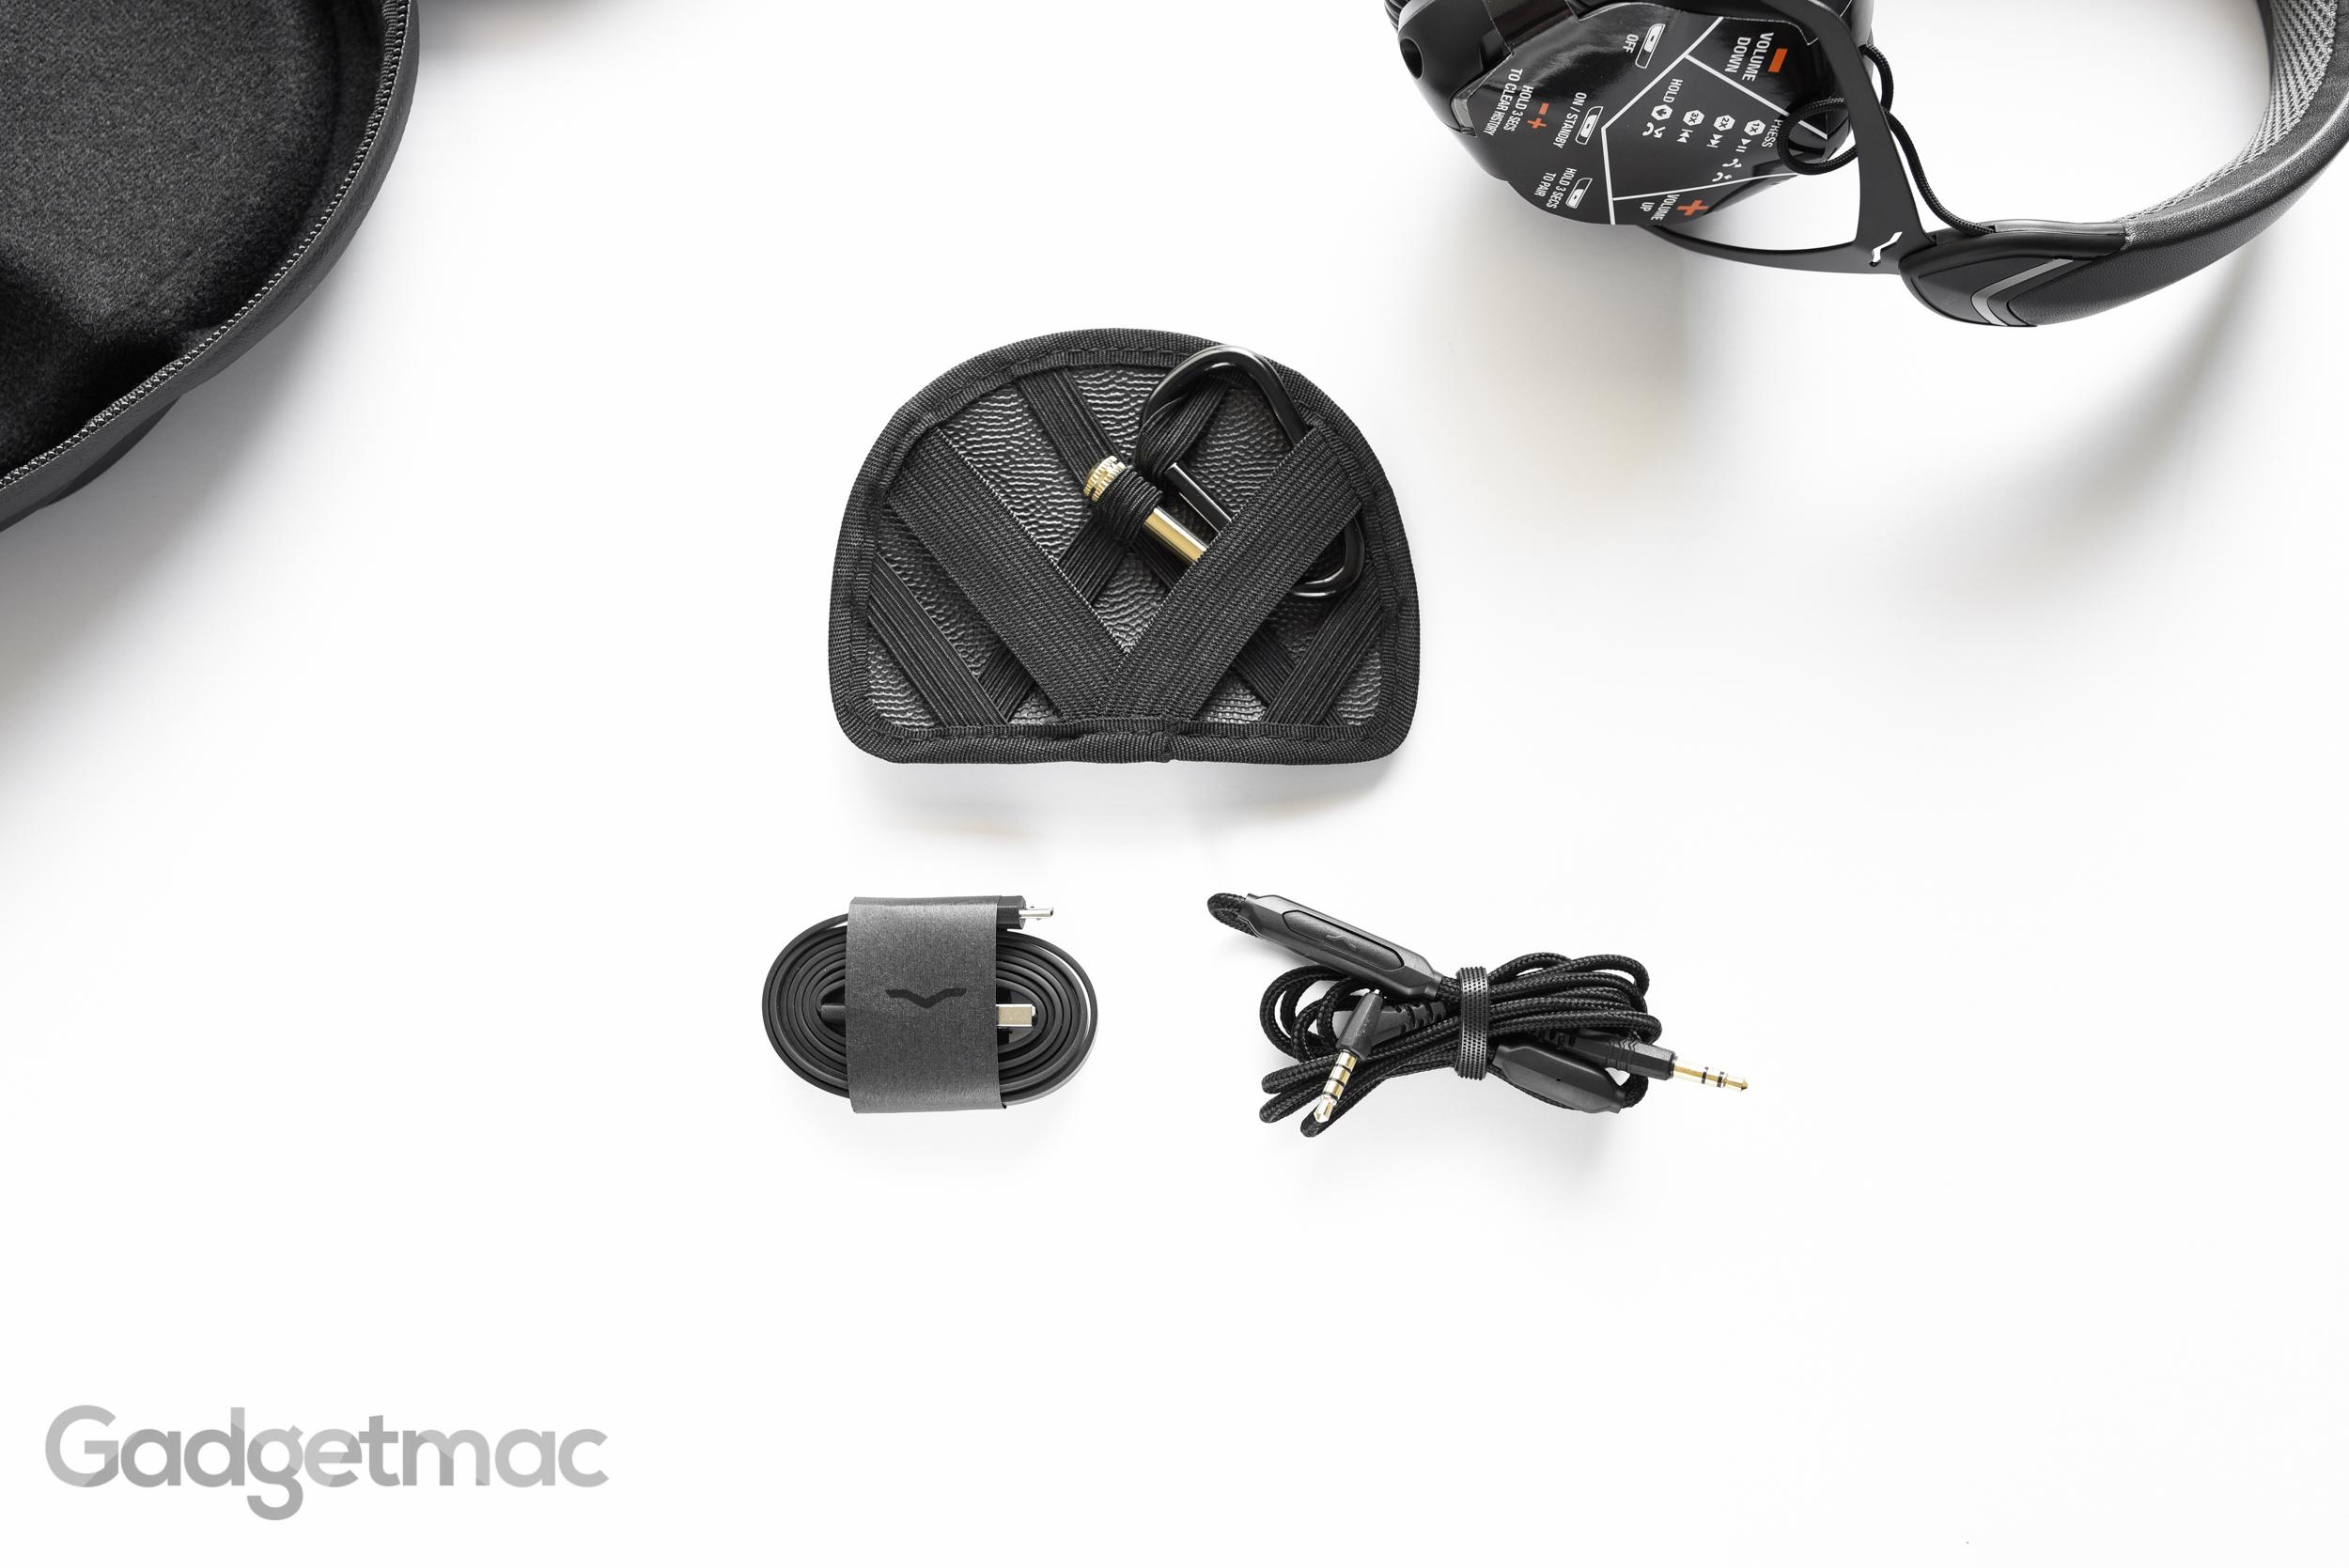 v-moda-crossfade-wireless-included-accessories.jpg